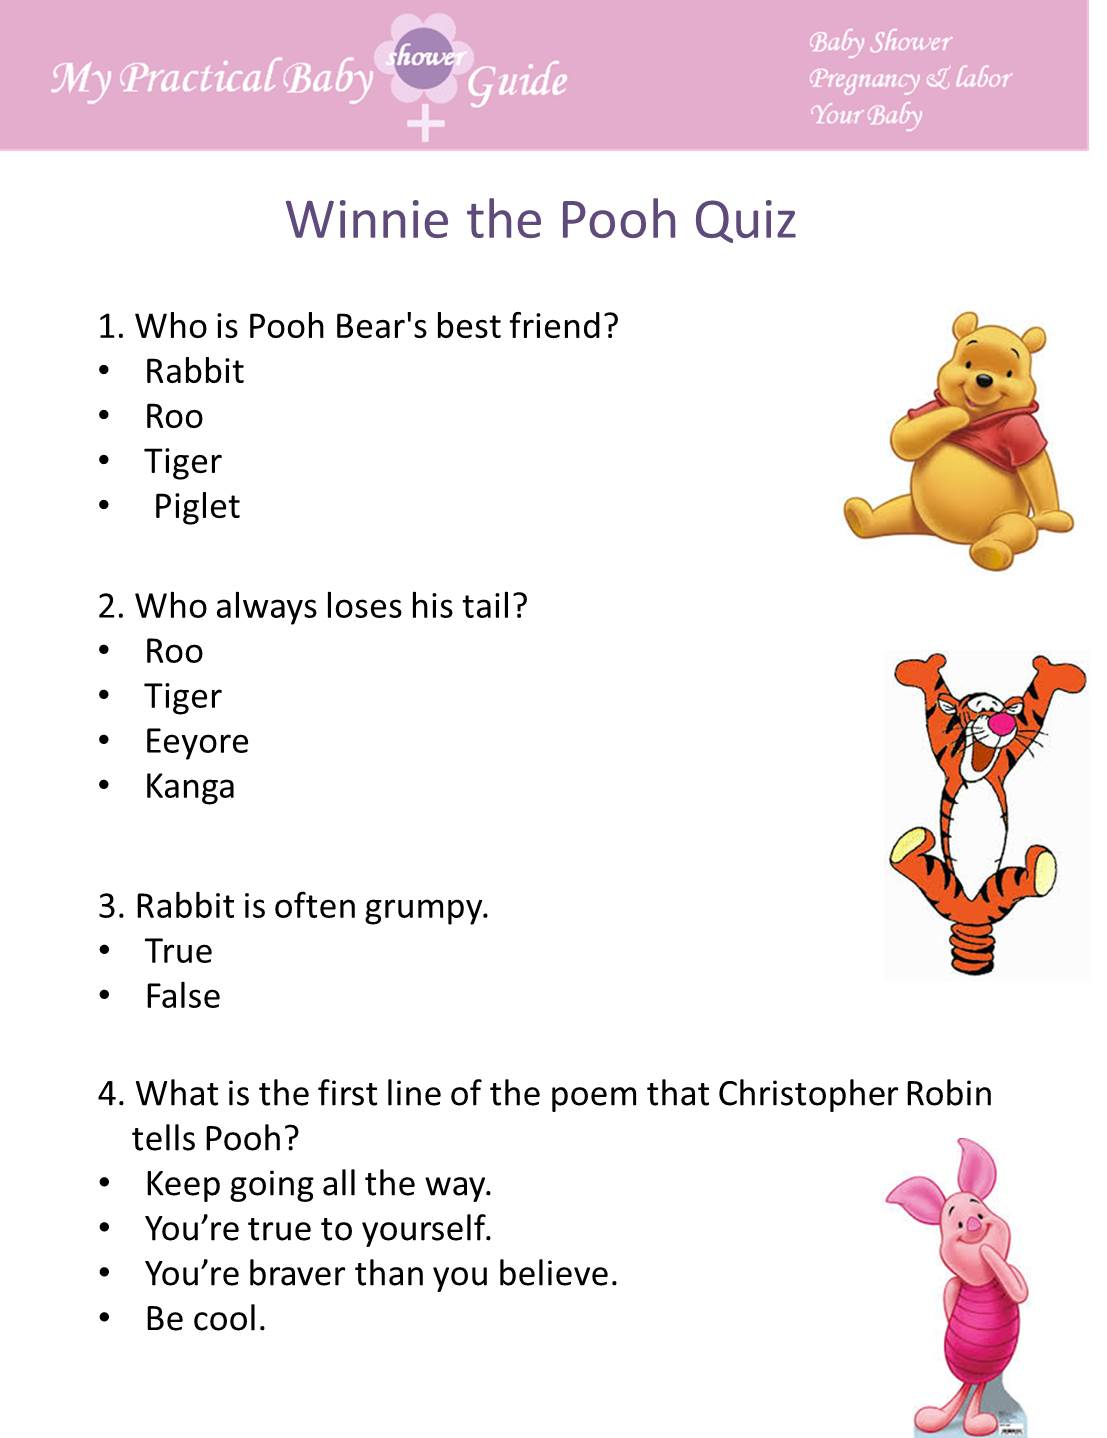 Winnie the Pooh Trivia Baby Shower Game